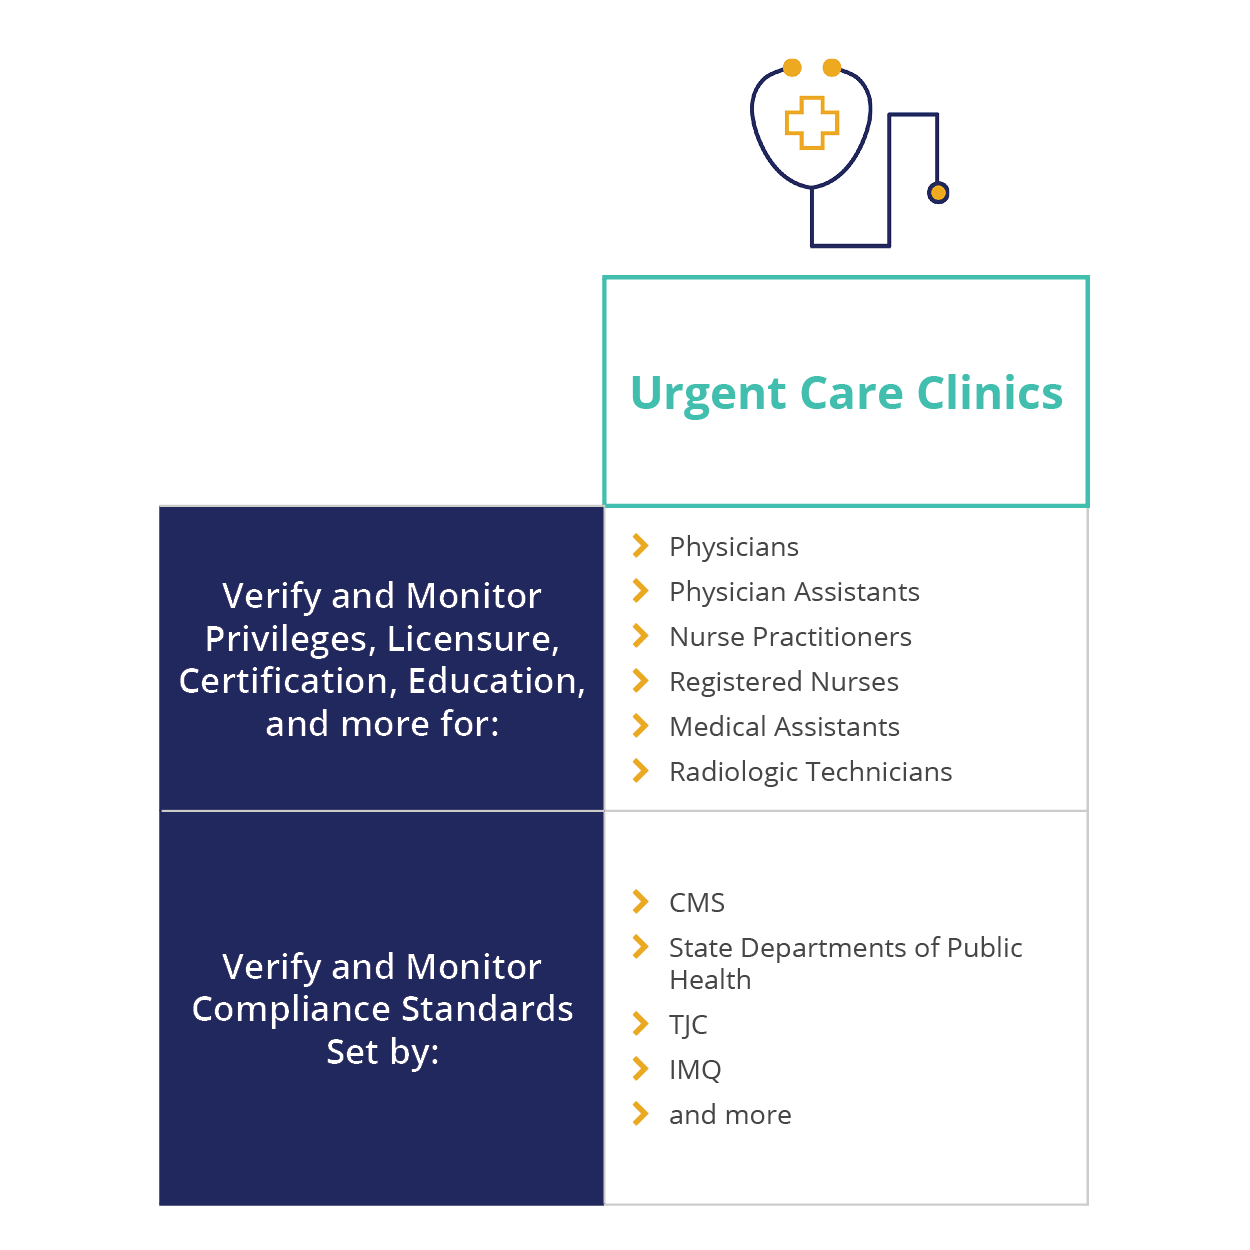 Urgent Care Clinics Distinct Care Settings = Disctinct Needs